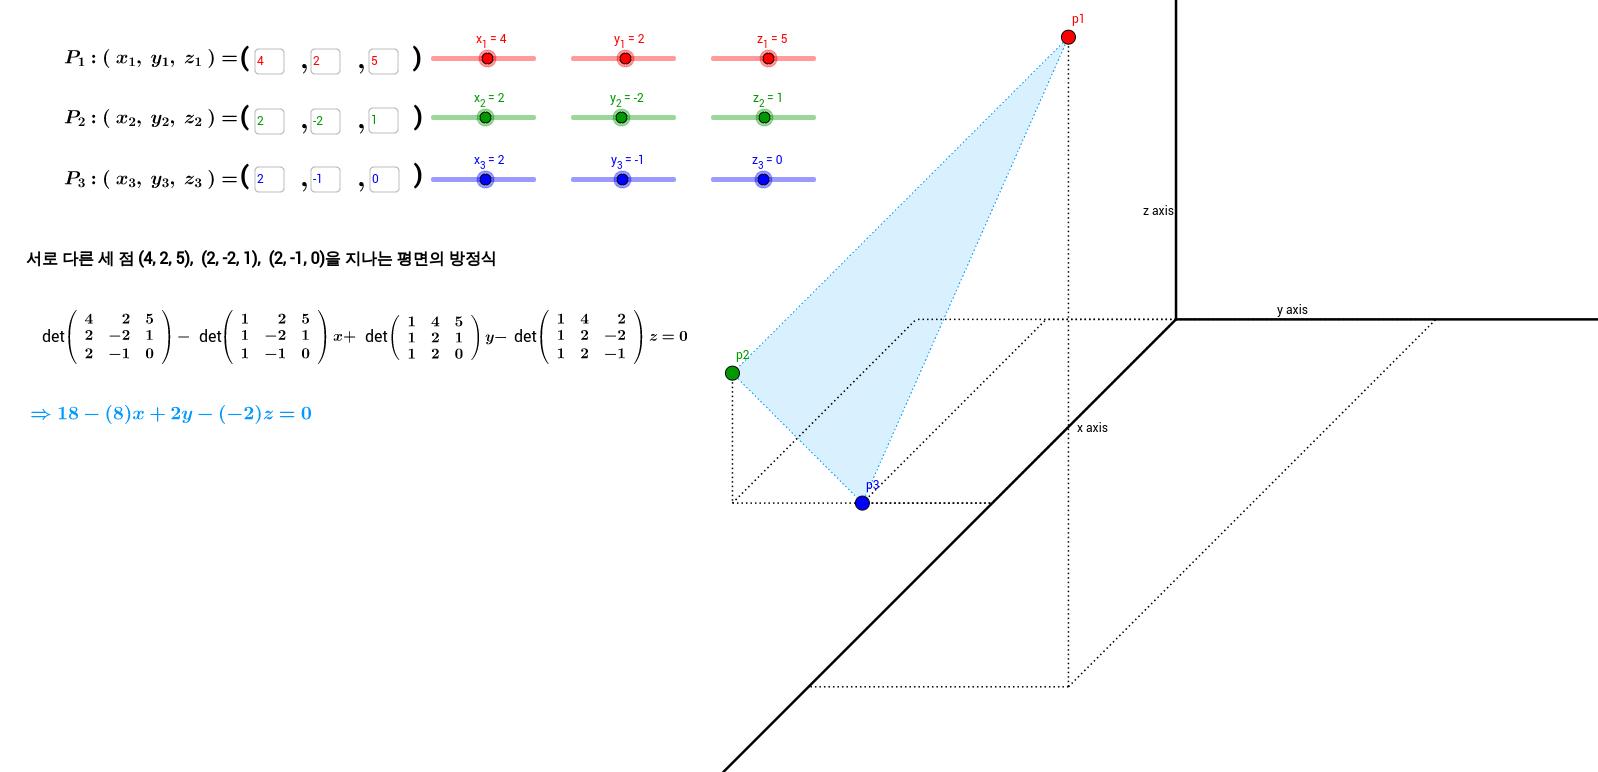 SKKU-Plane Equation